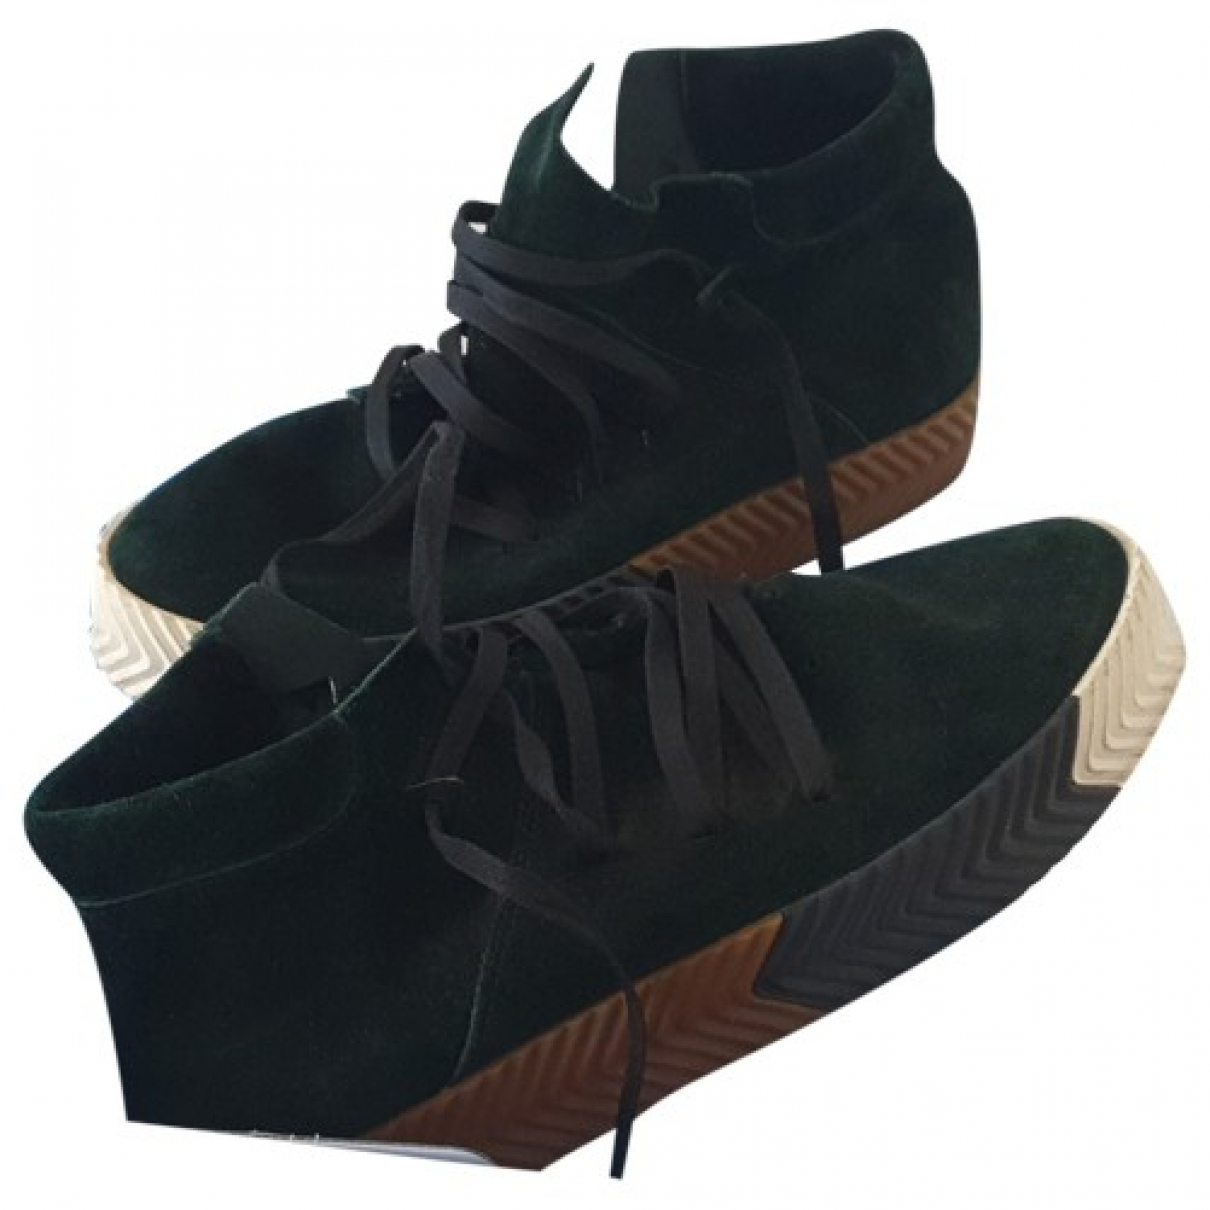 Adidas Originals x Alexander Wang Cloth high trainers